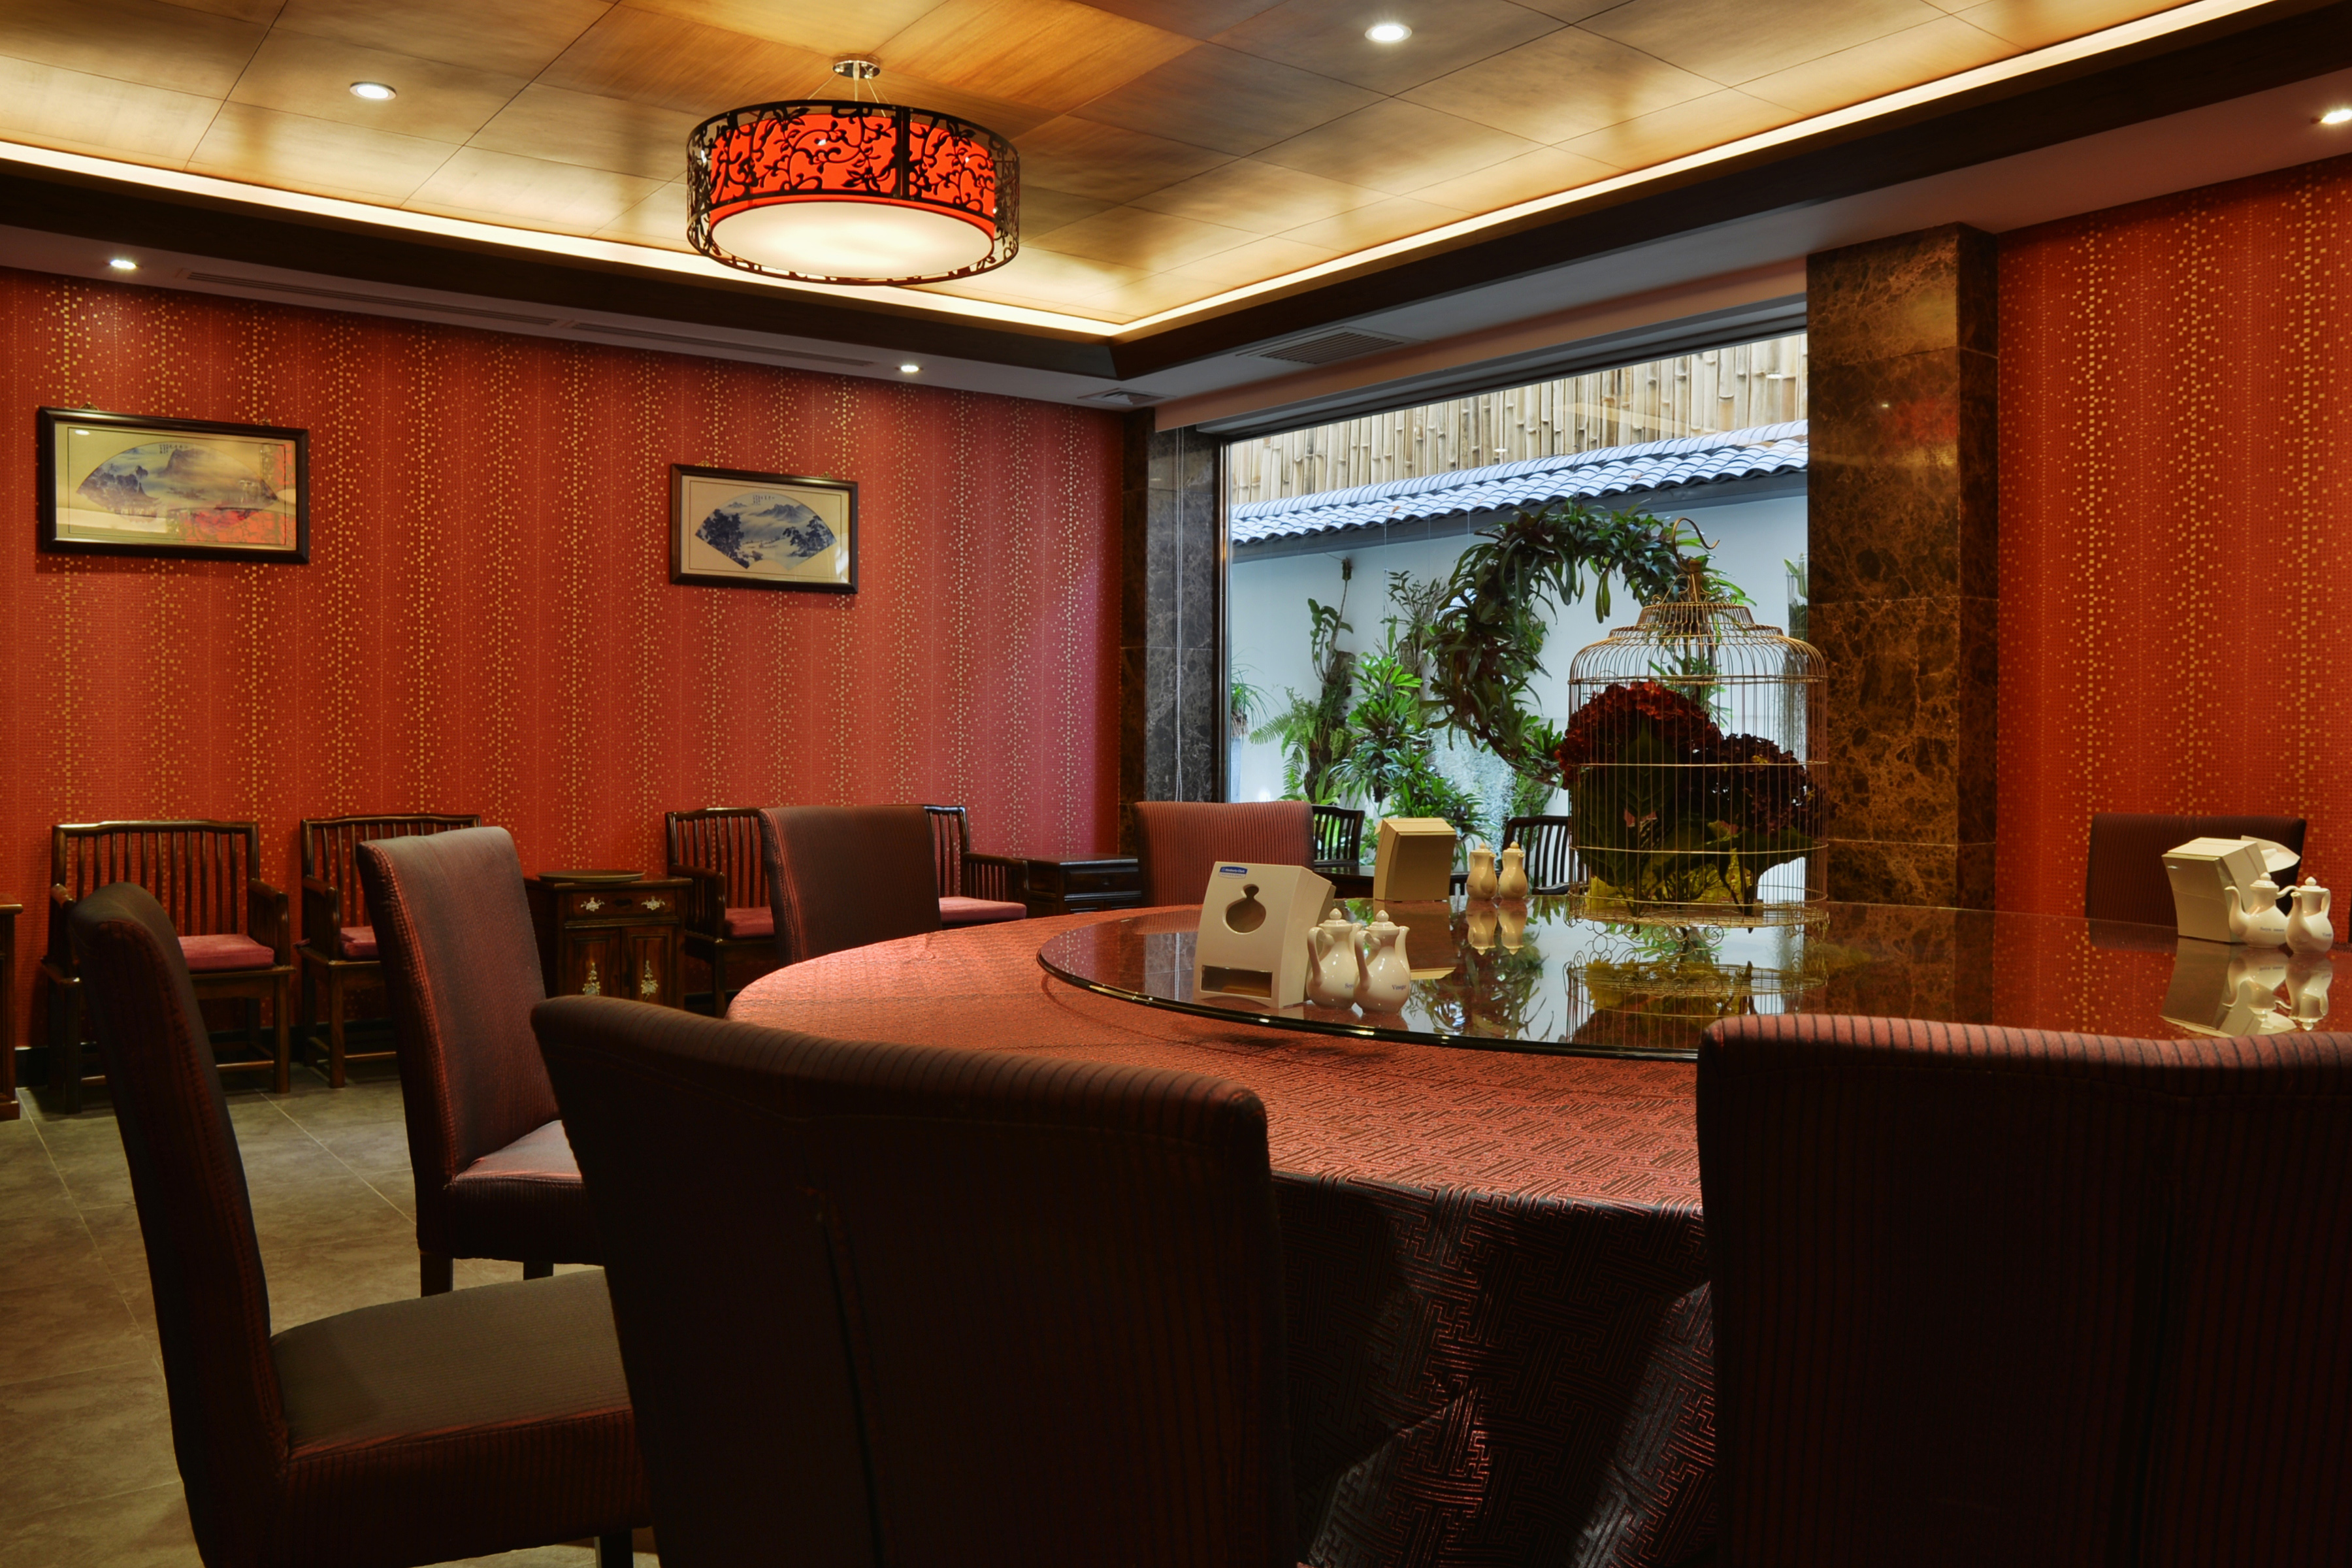 Taiming Hotel- LanPin Restaurant